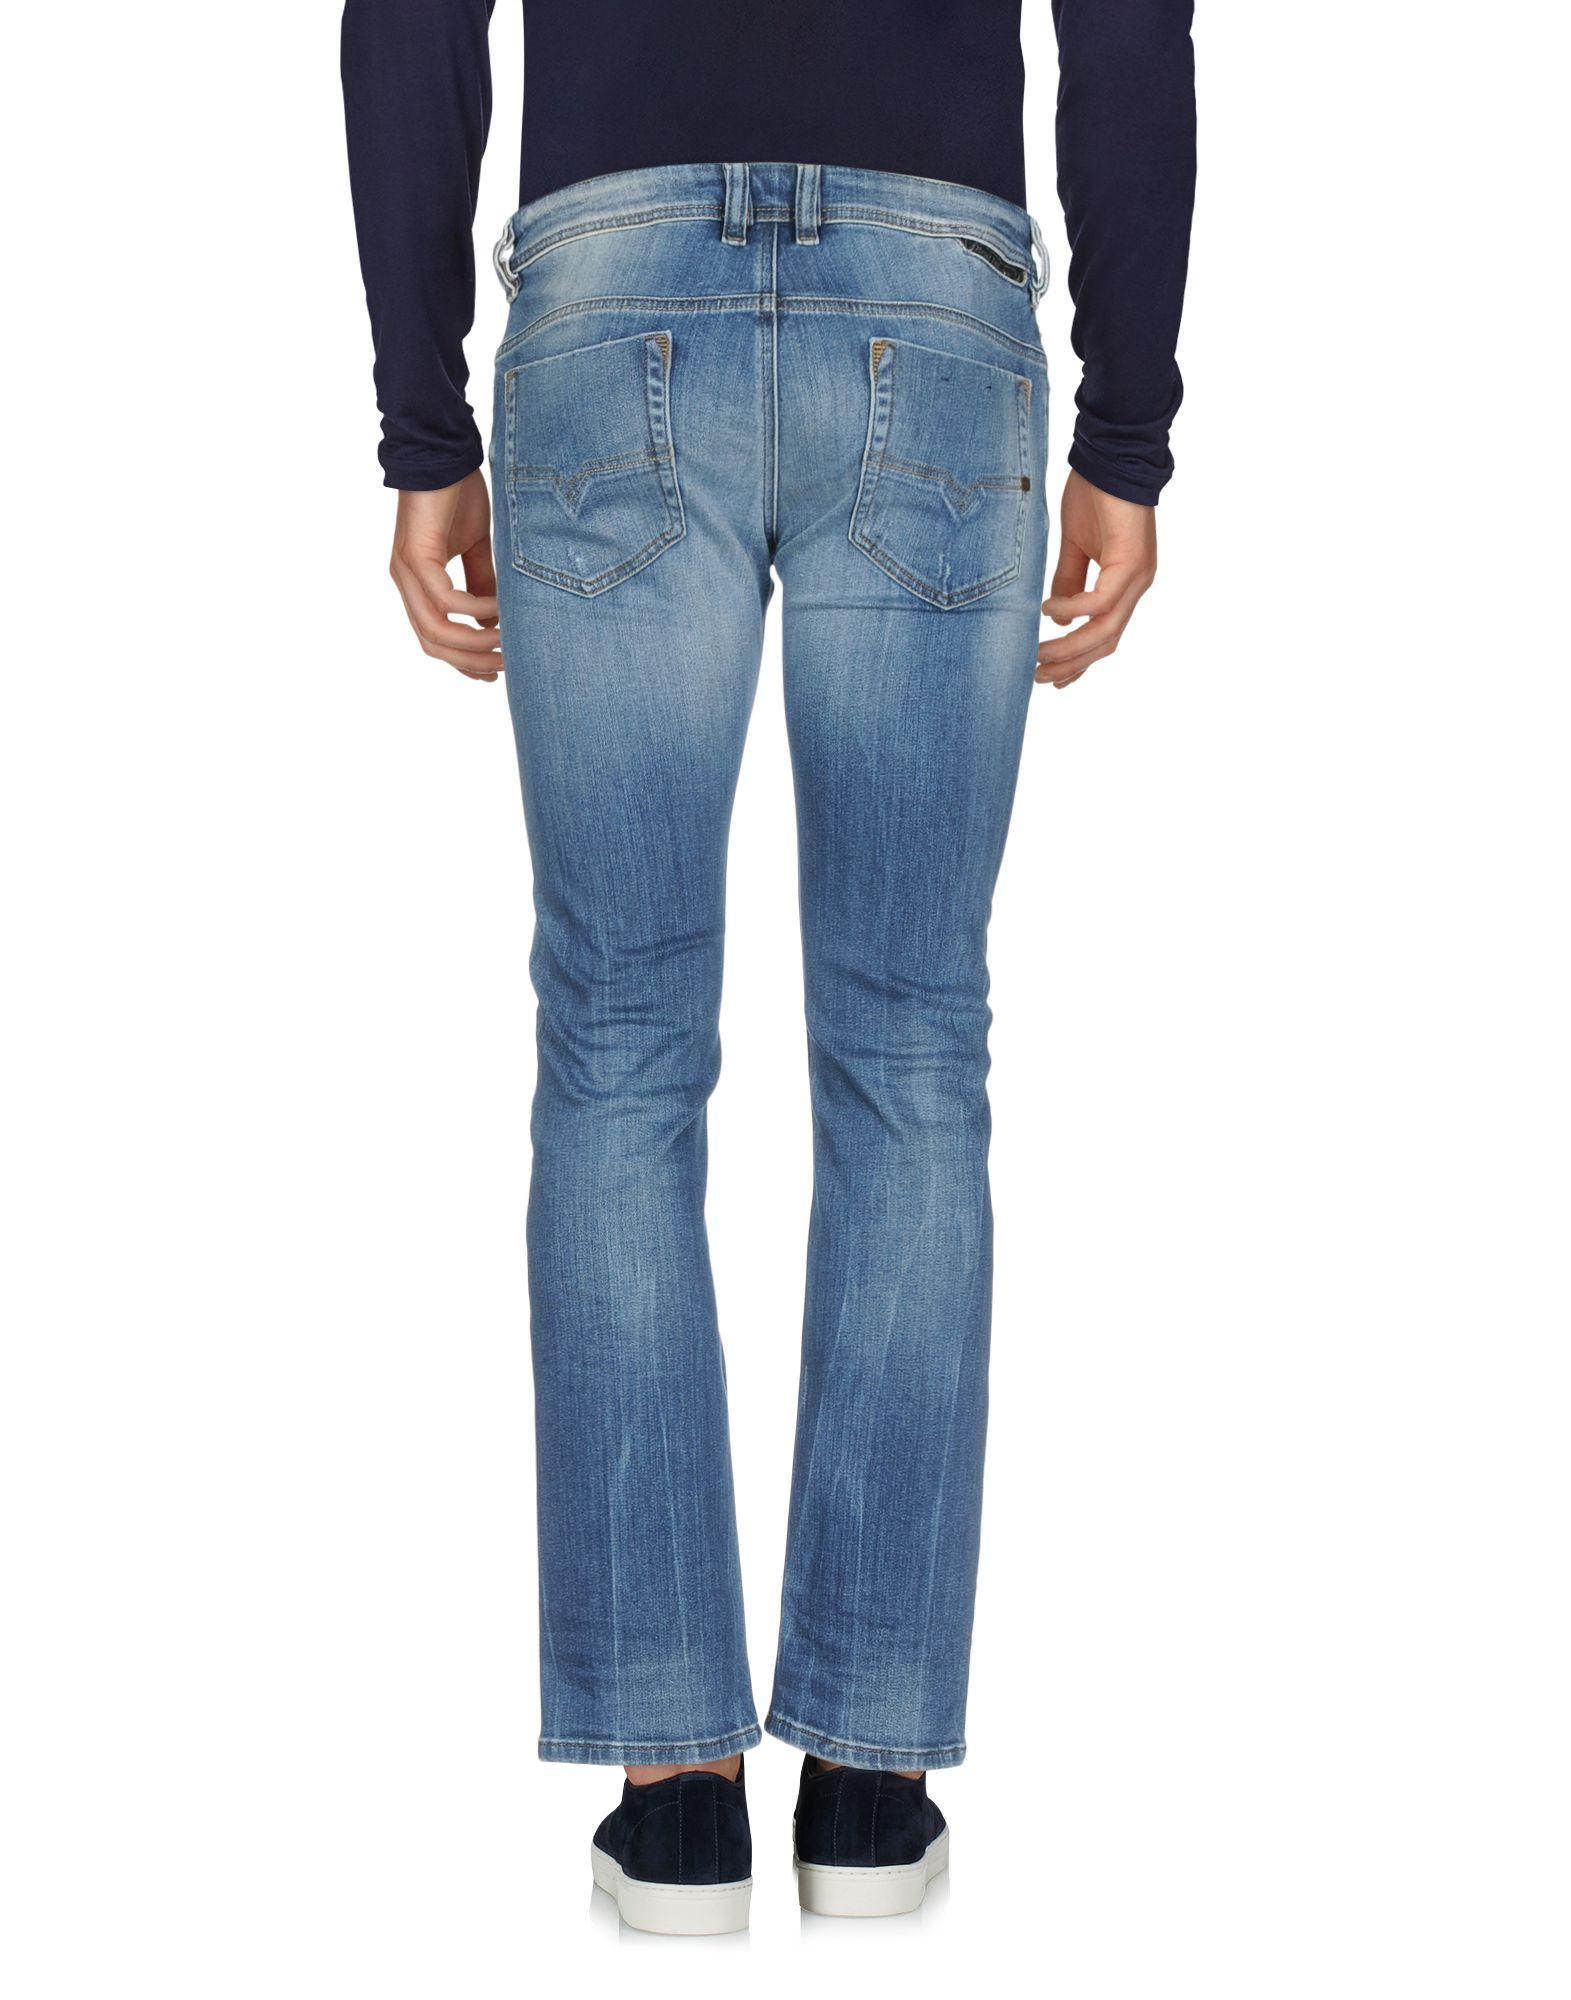 Pantaloni Jeans Diesel 42673216VA Uomo - 42673216VA Diesel cf034c